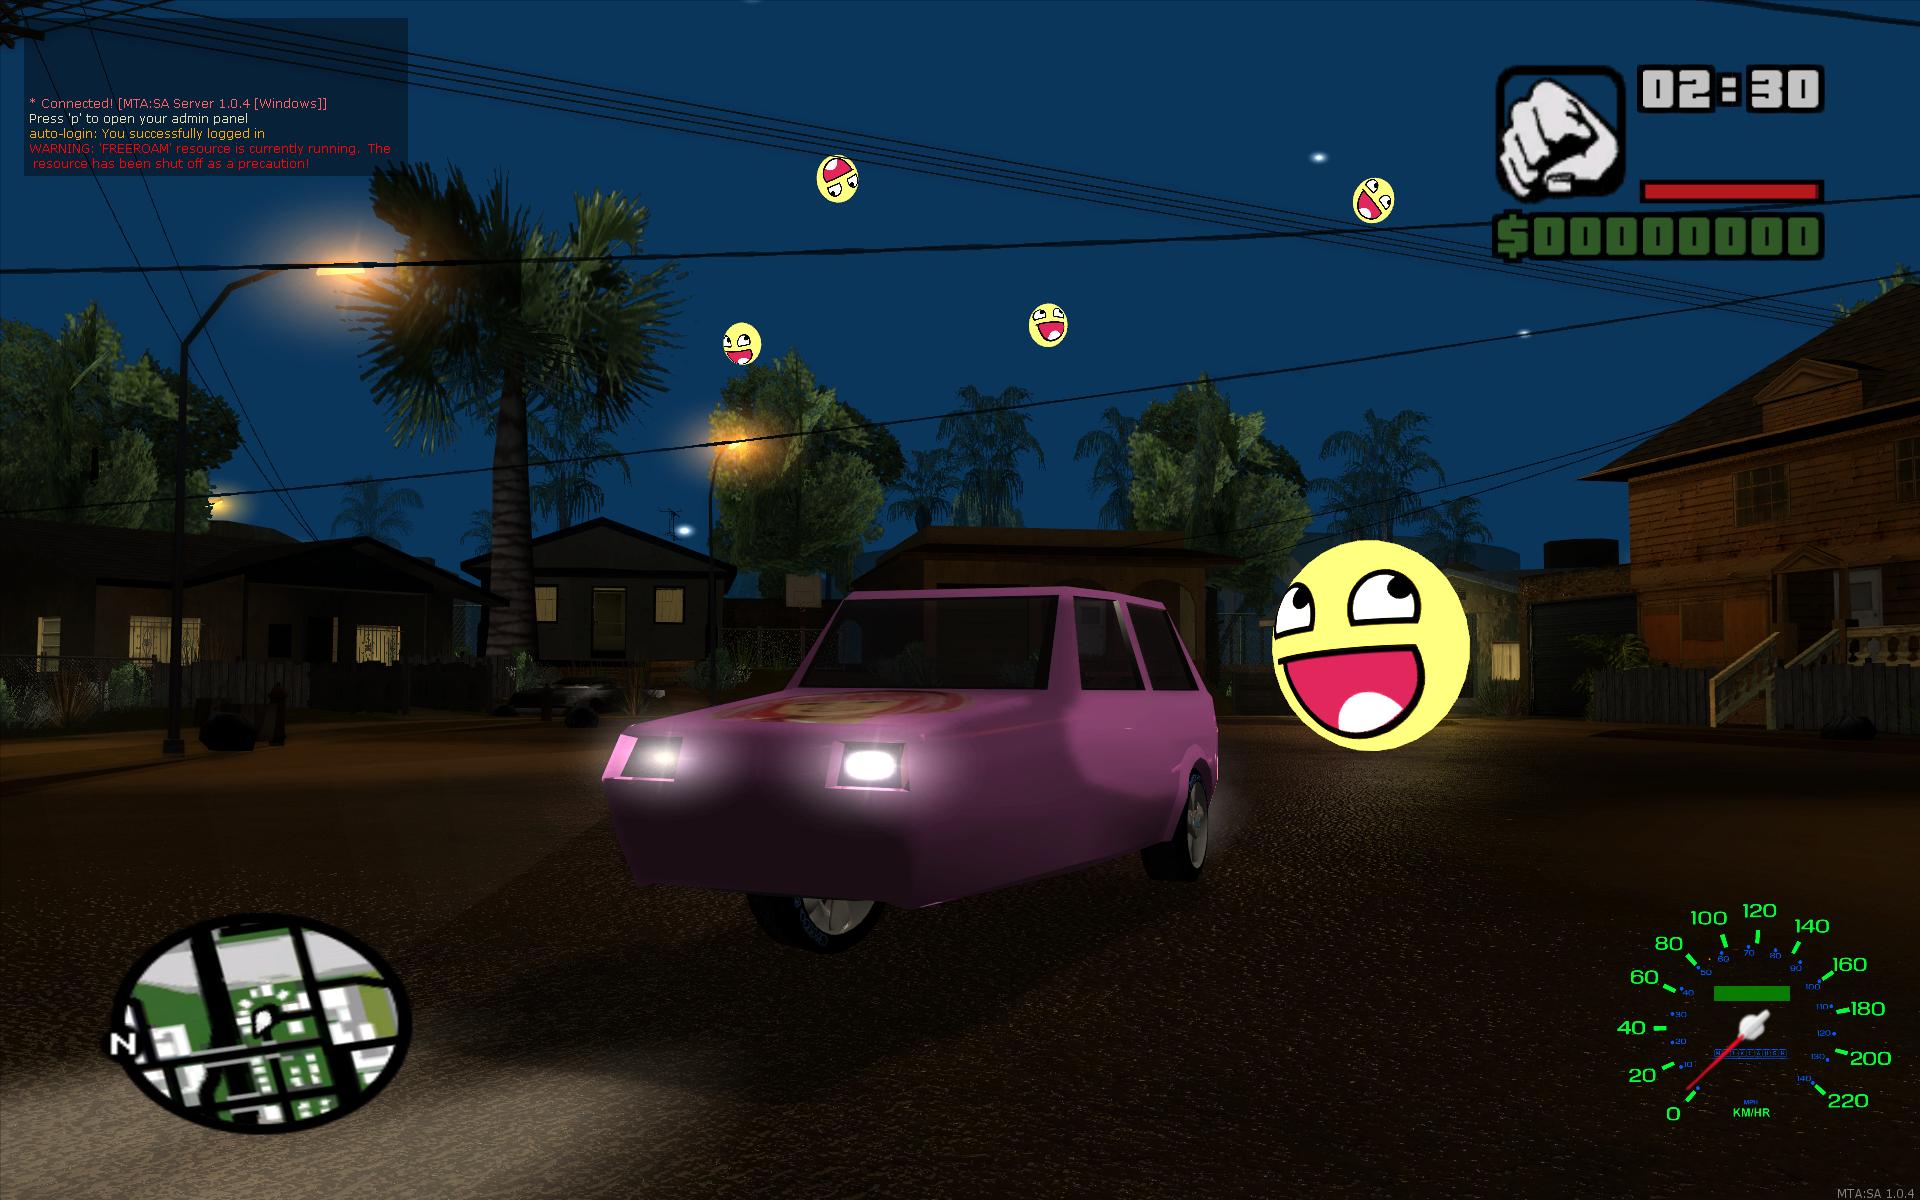 Custom Models image - Multi Theft Auto: San Andreas mod for Grand